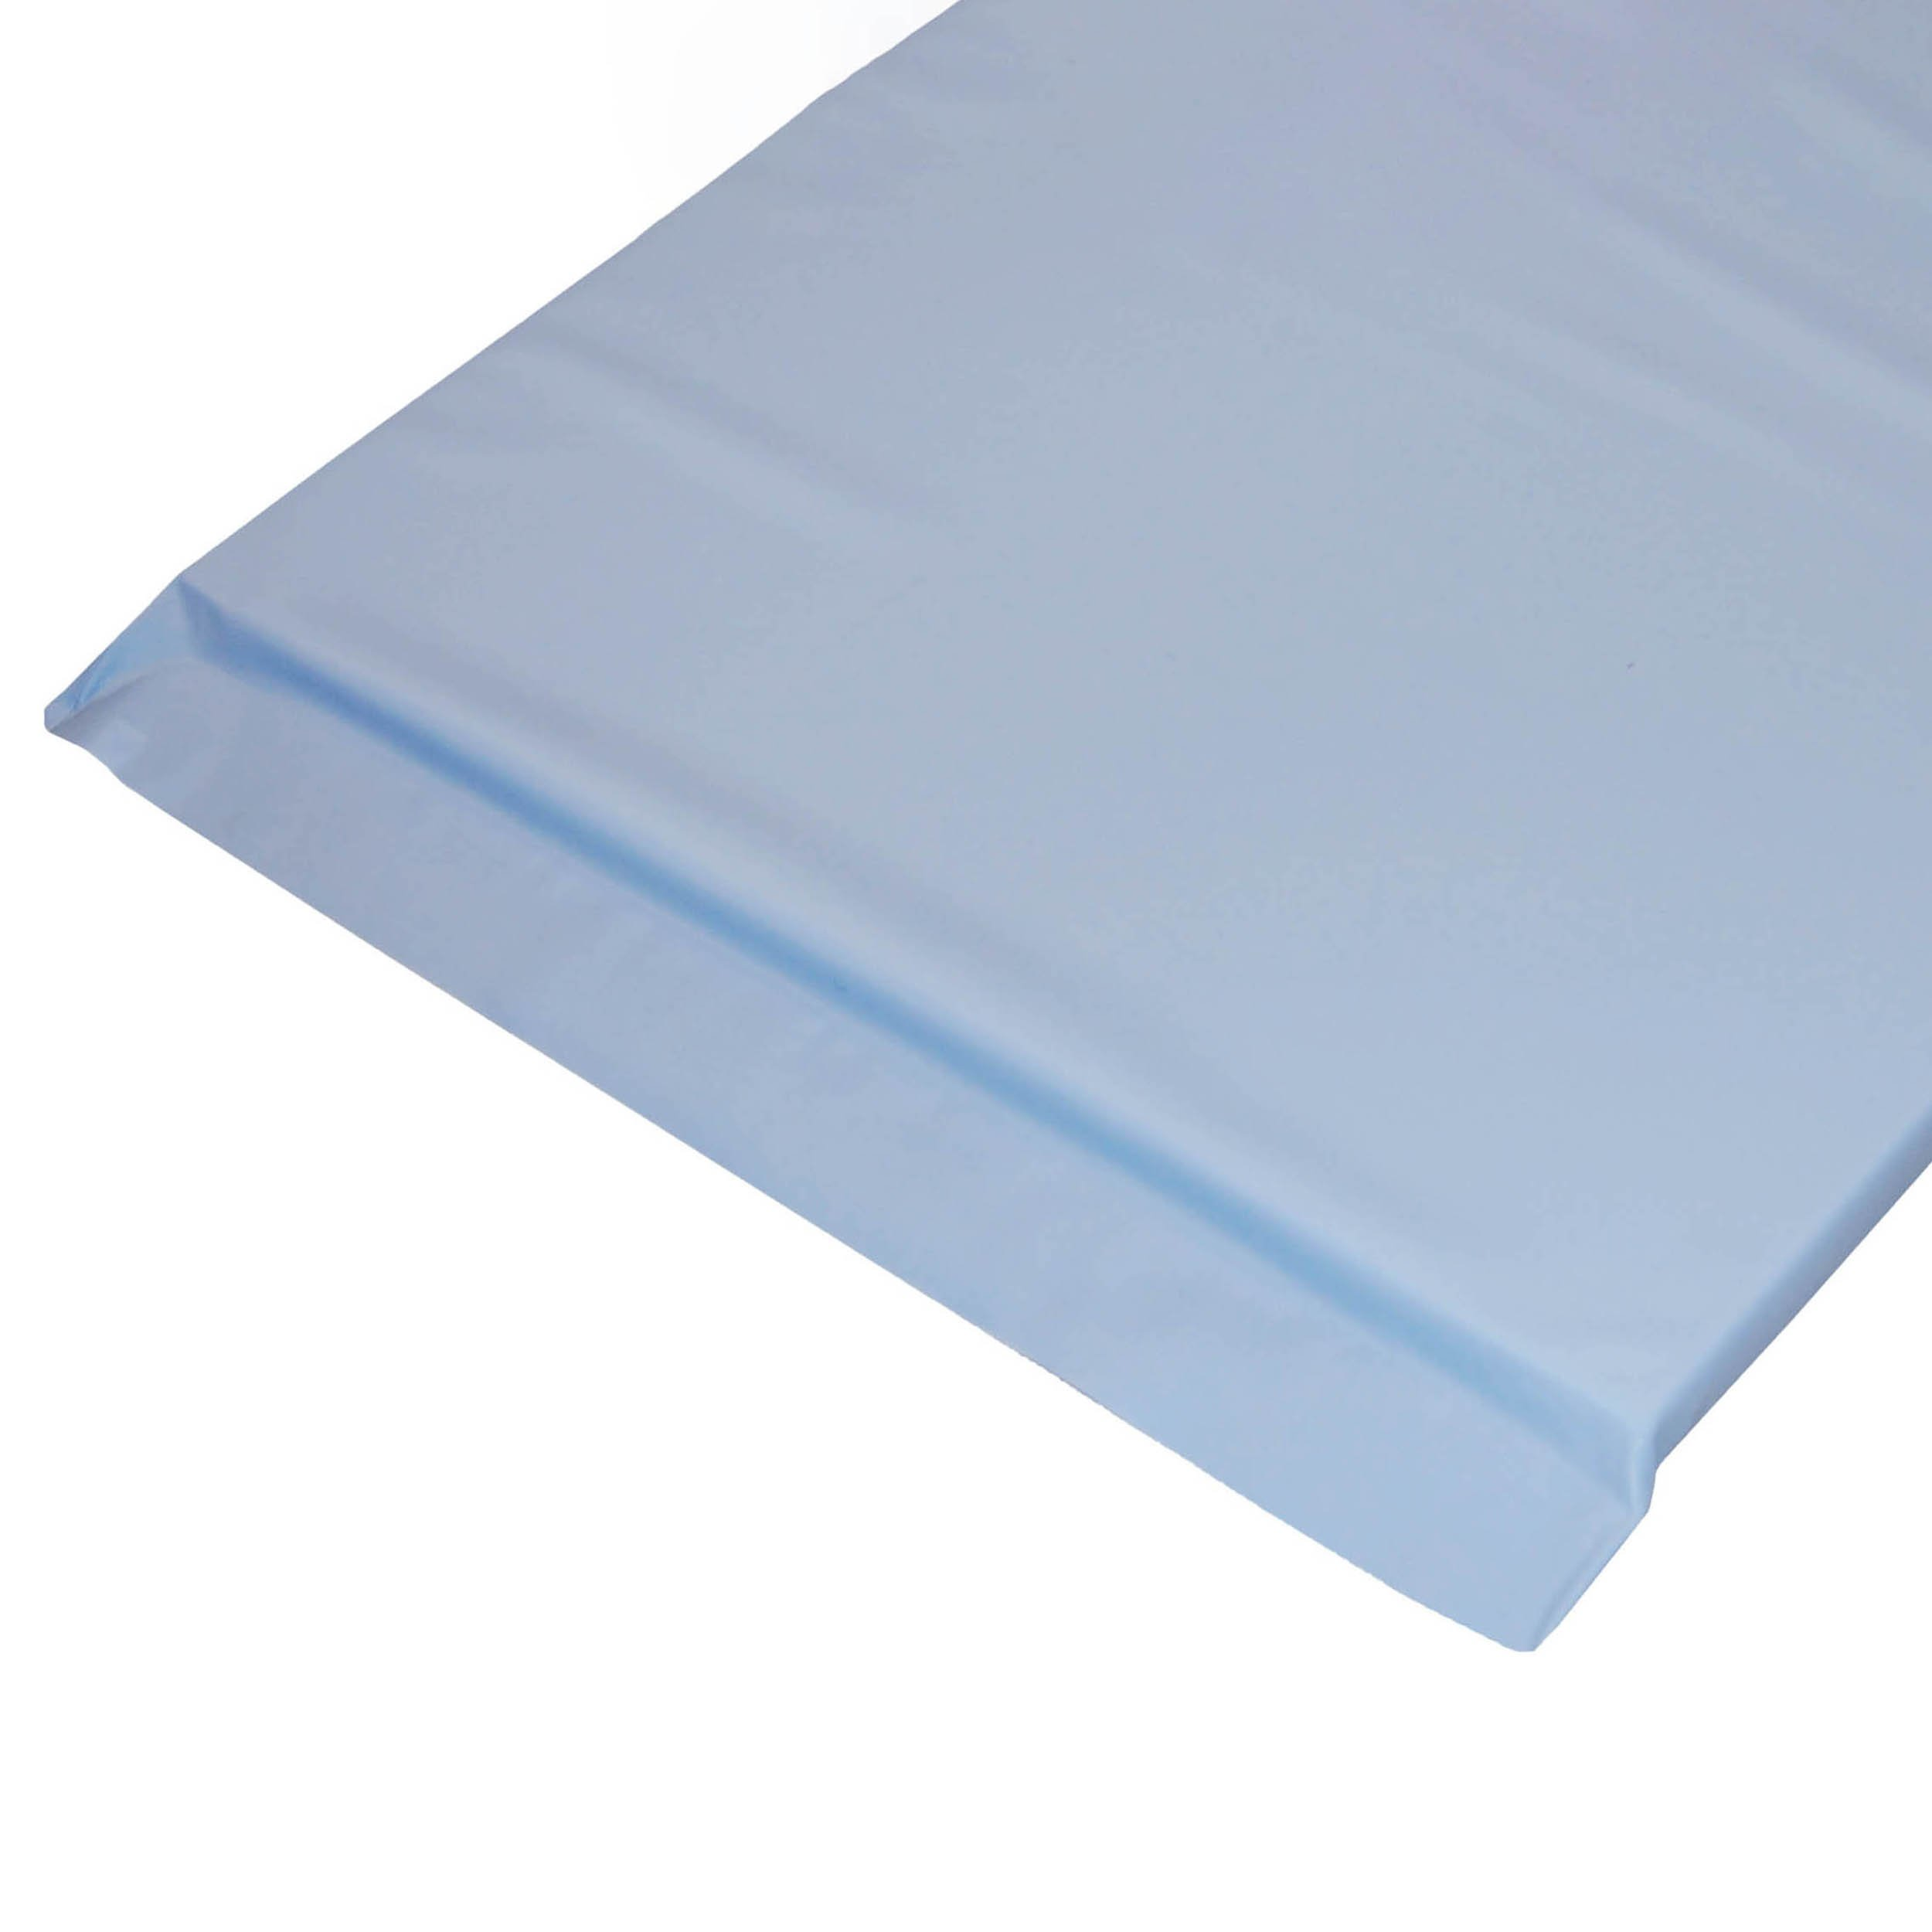 Economy Standard Radiolucent X-Ray Comfort Foam Table Pad - Light Blue Vinyl, No Grommets 72